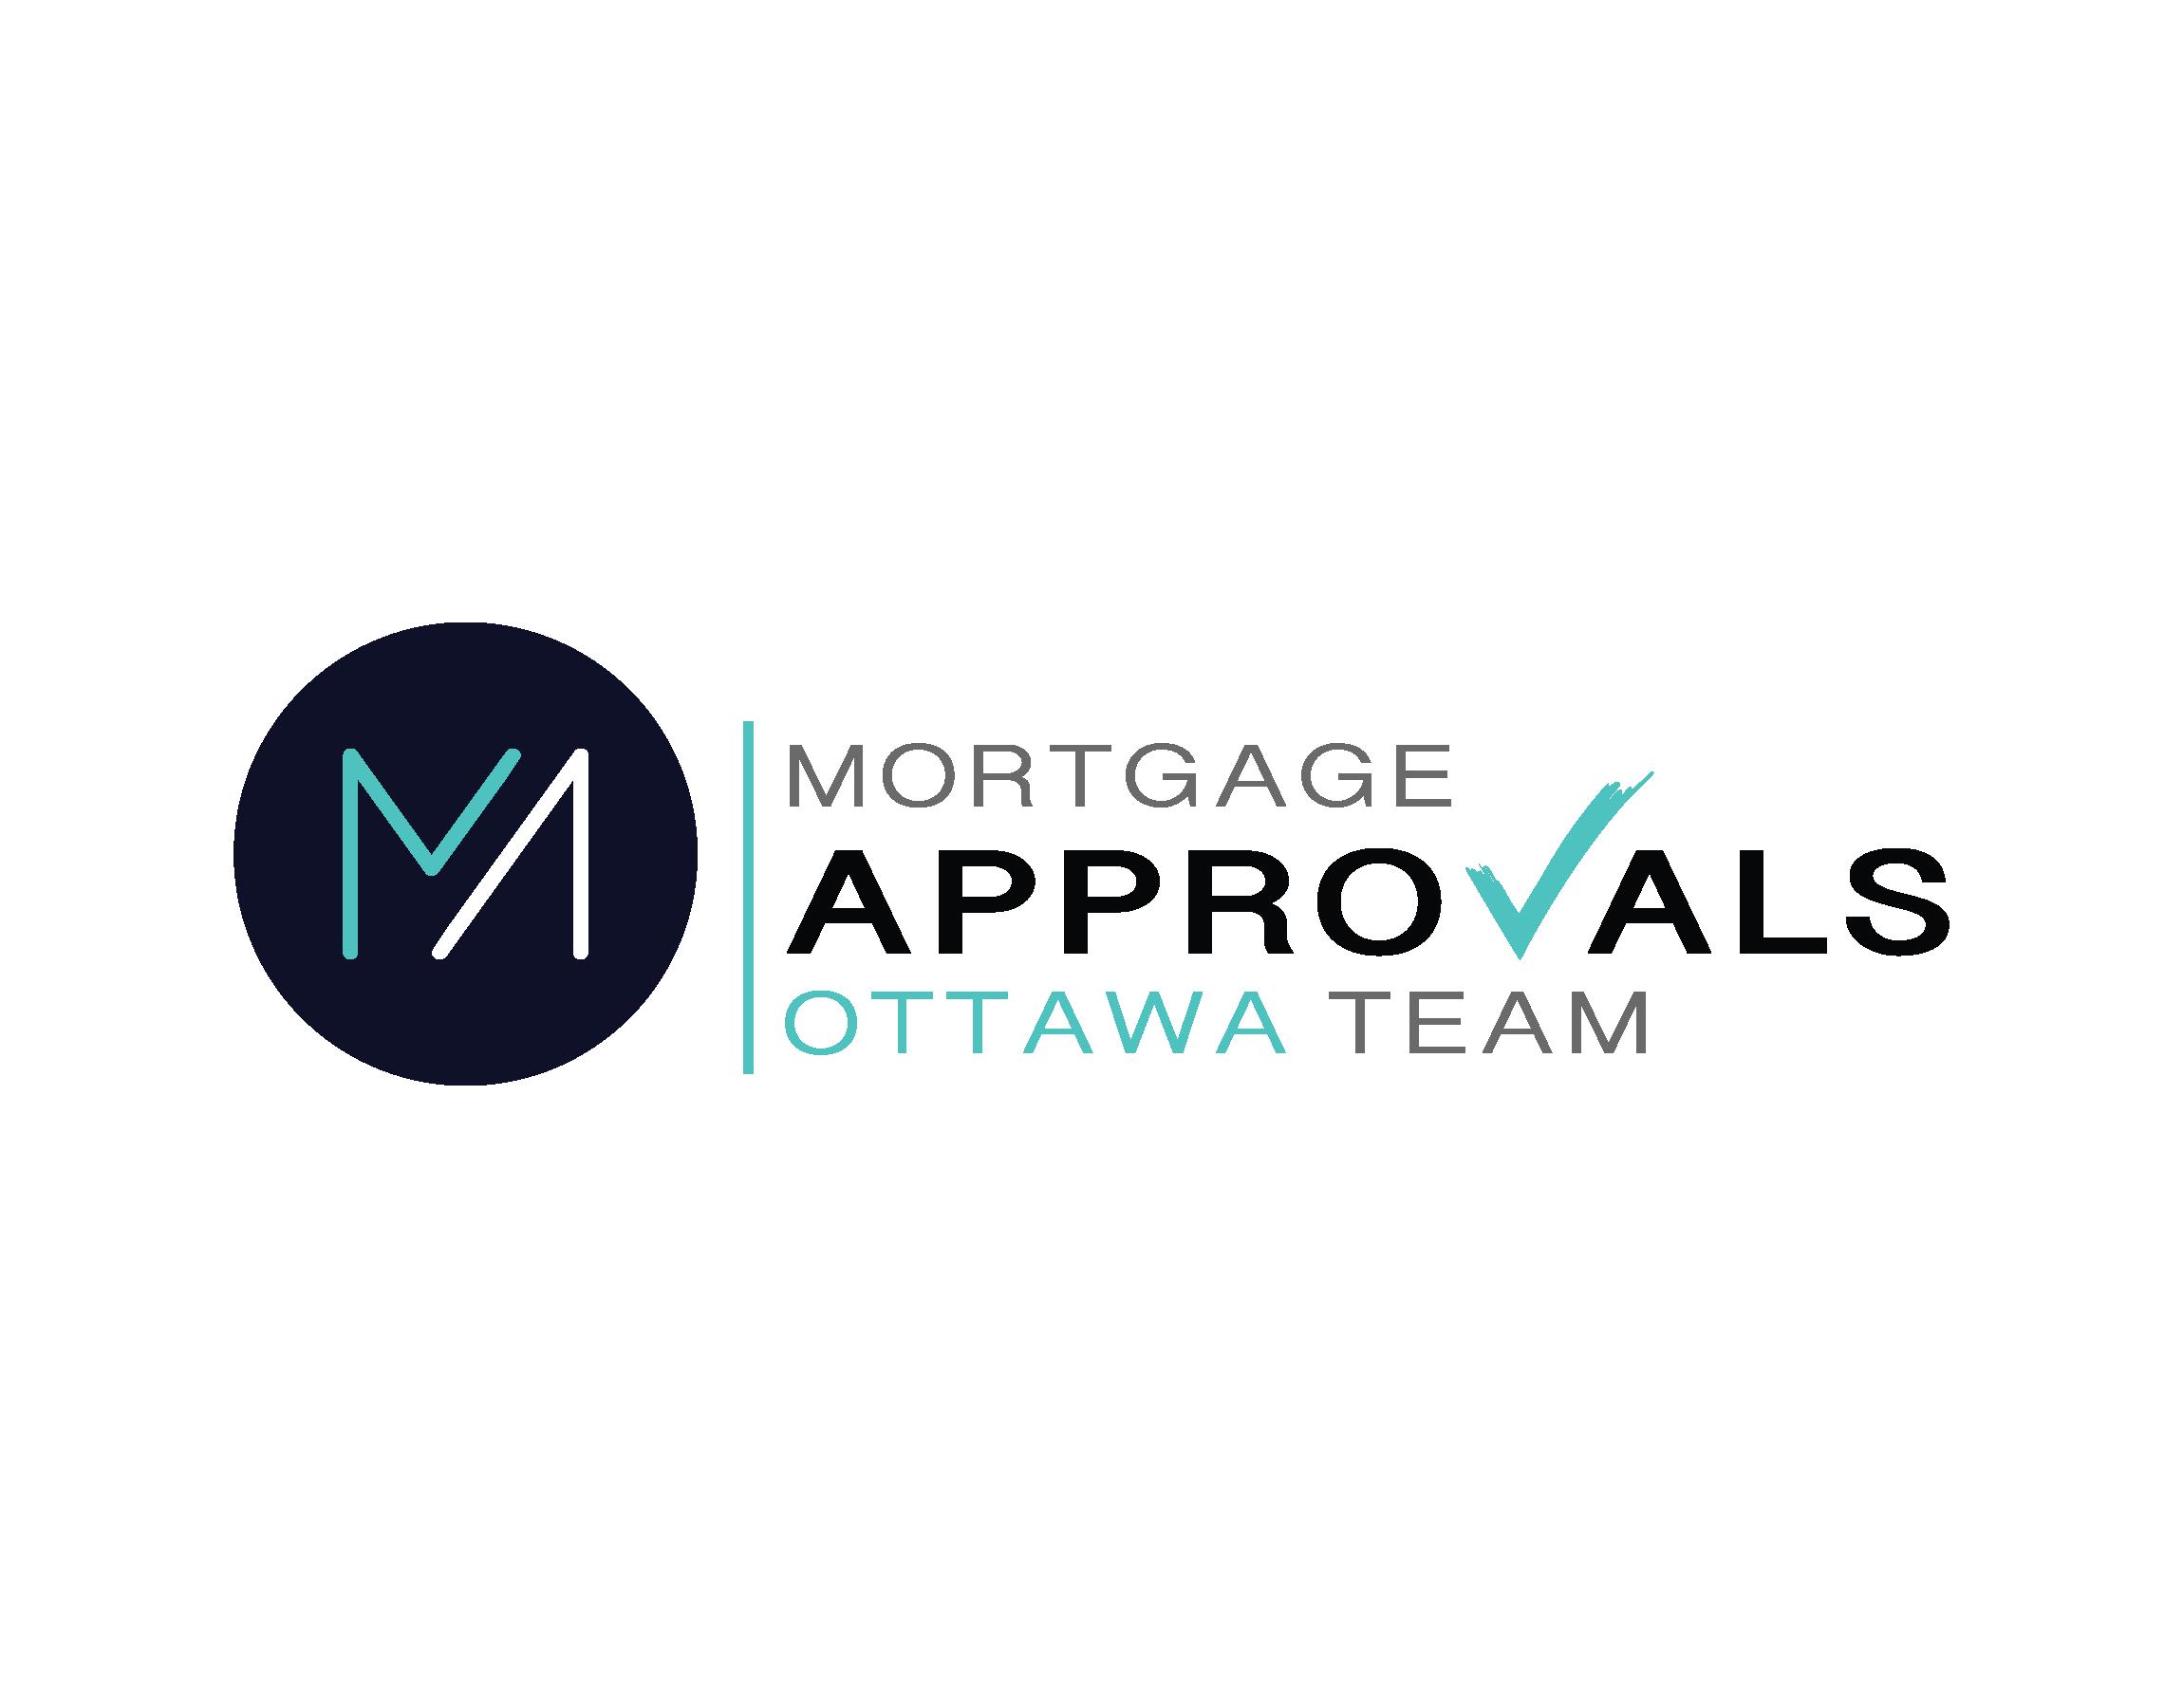 Mortgage Approvals Ottawa Team surpasses 1 billion $ in funding